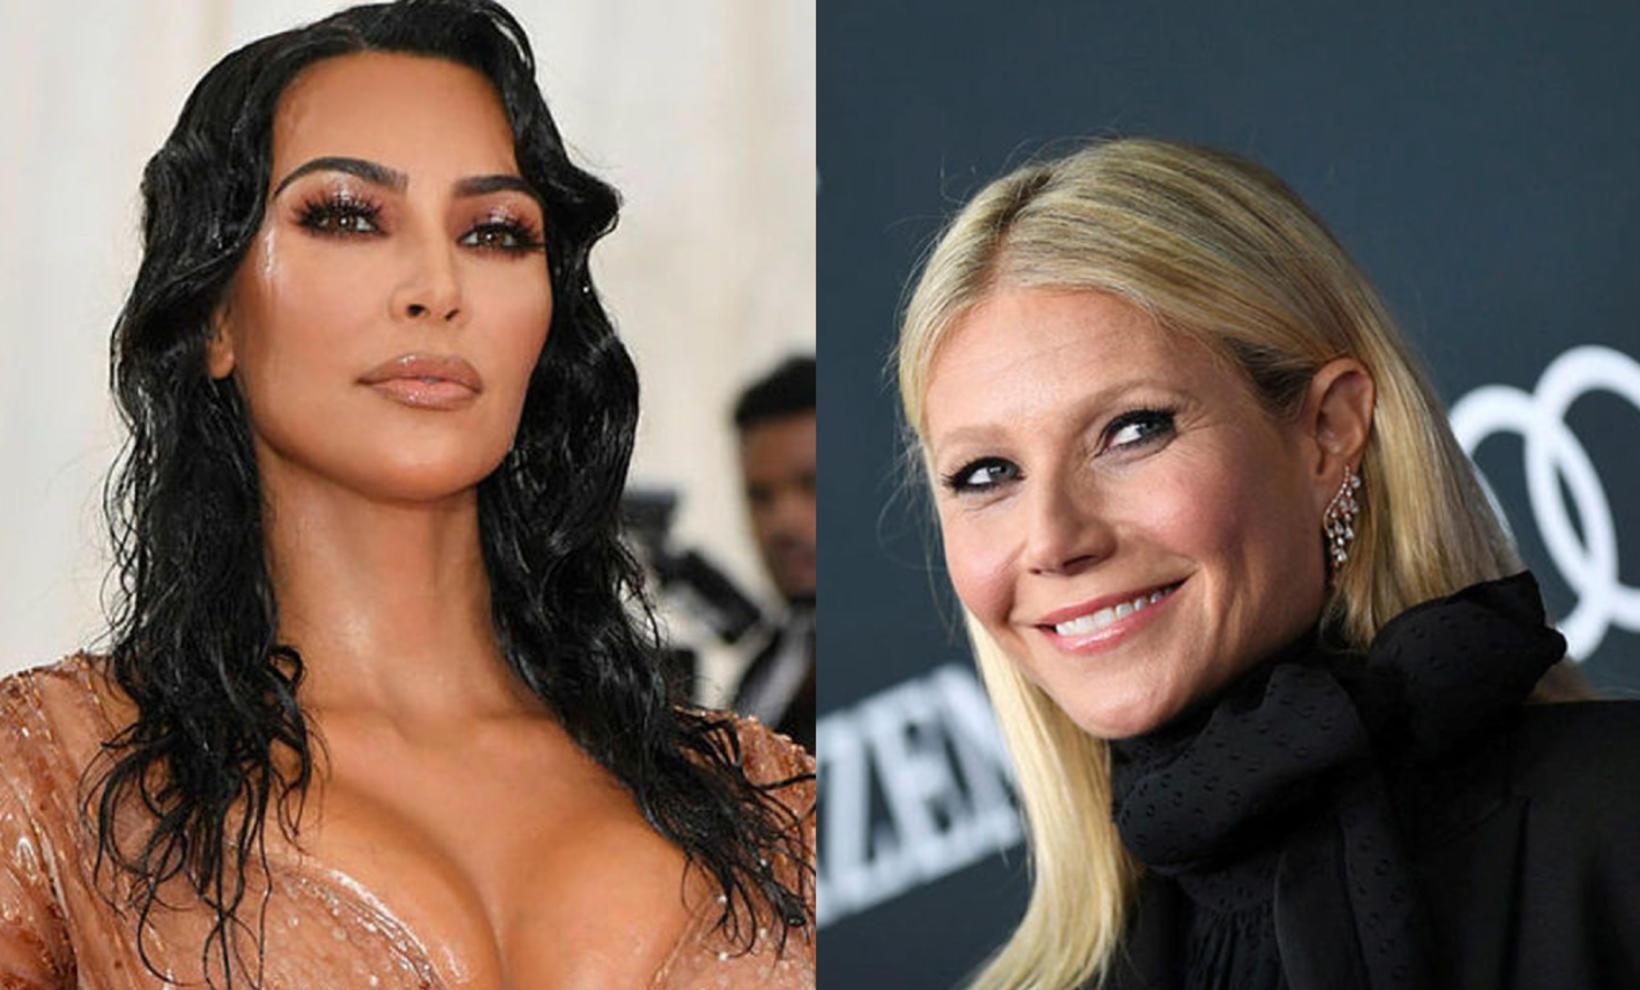 Gwyneth Palthrow sendi vinkonu sinni Kim Kardashian skemmtilegan pakka á …